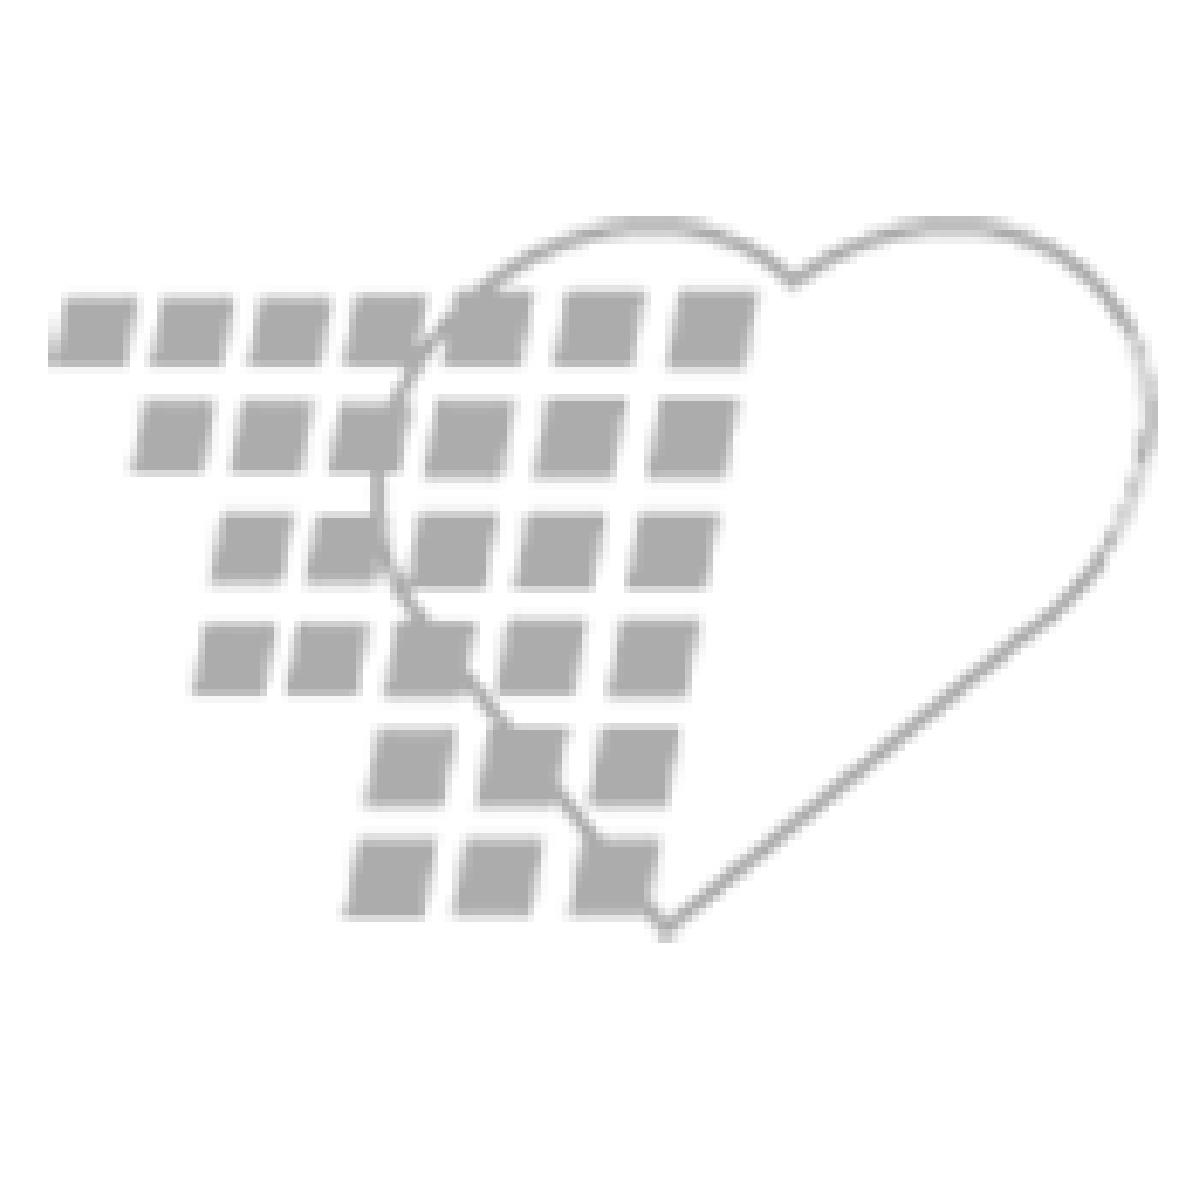 06-93-6205 Demo Dose® Simulated Platelets O Rh Positive